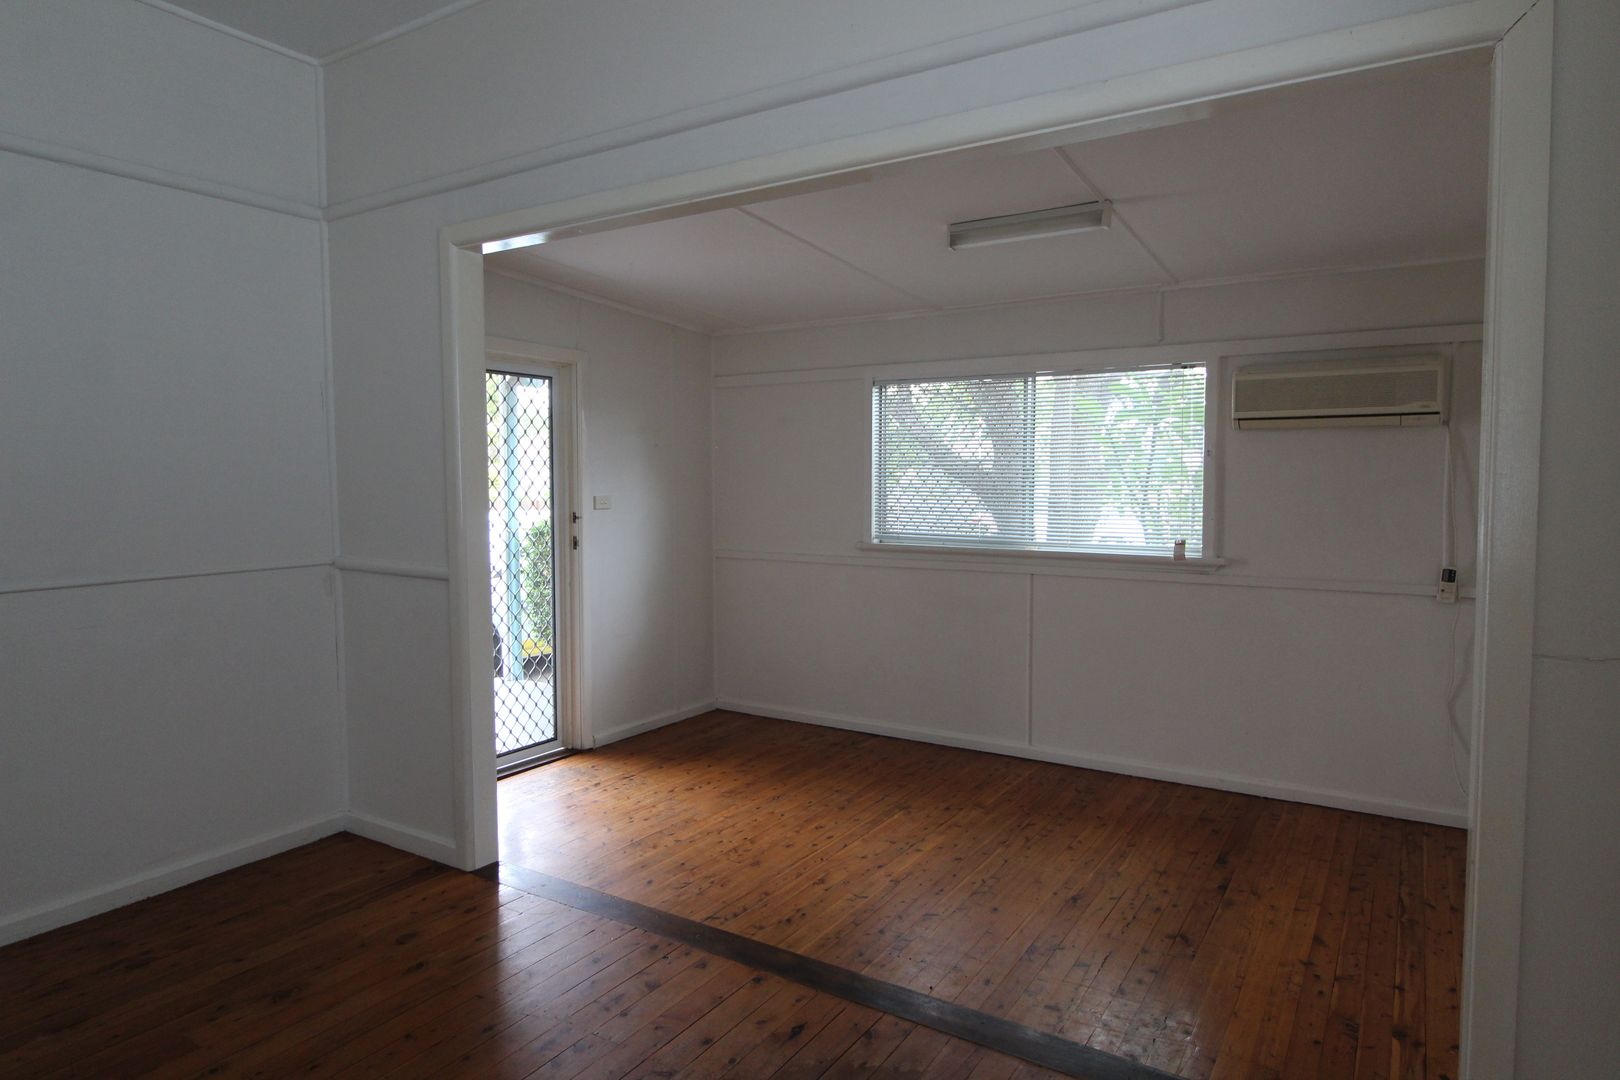 183 Trafalgar Ave, Umina Beach NSW 2257, Image 2